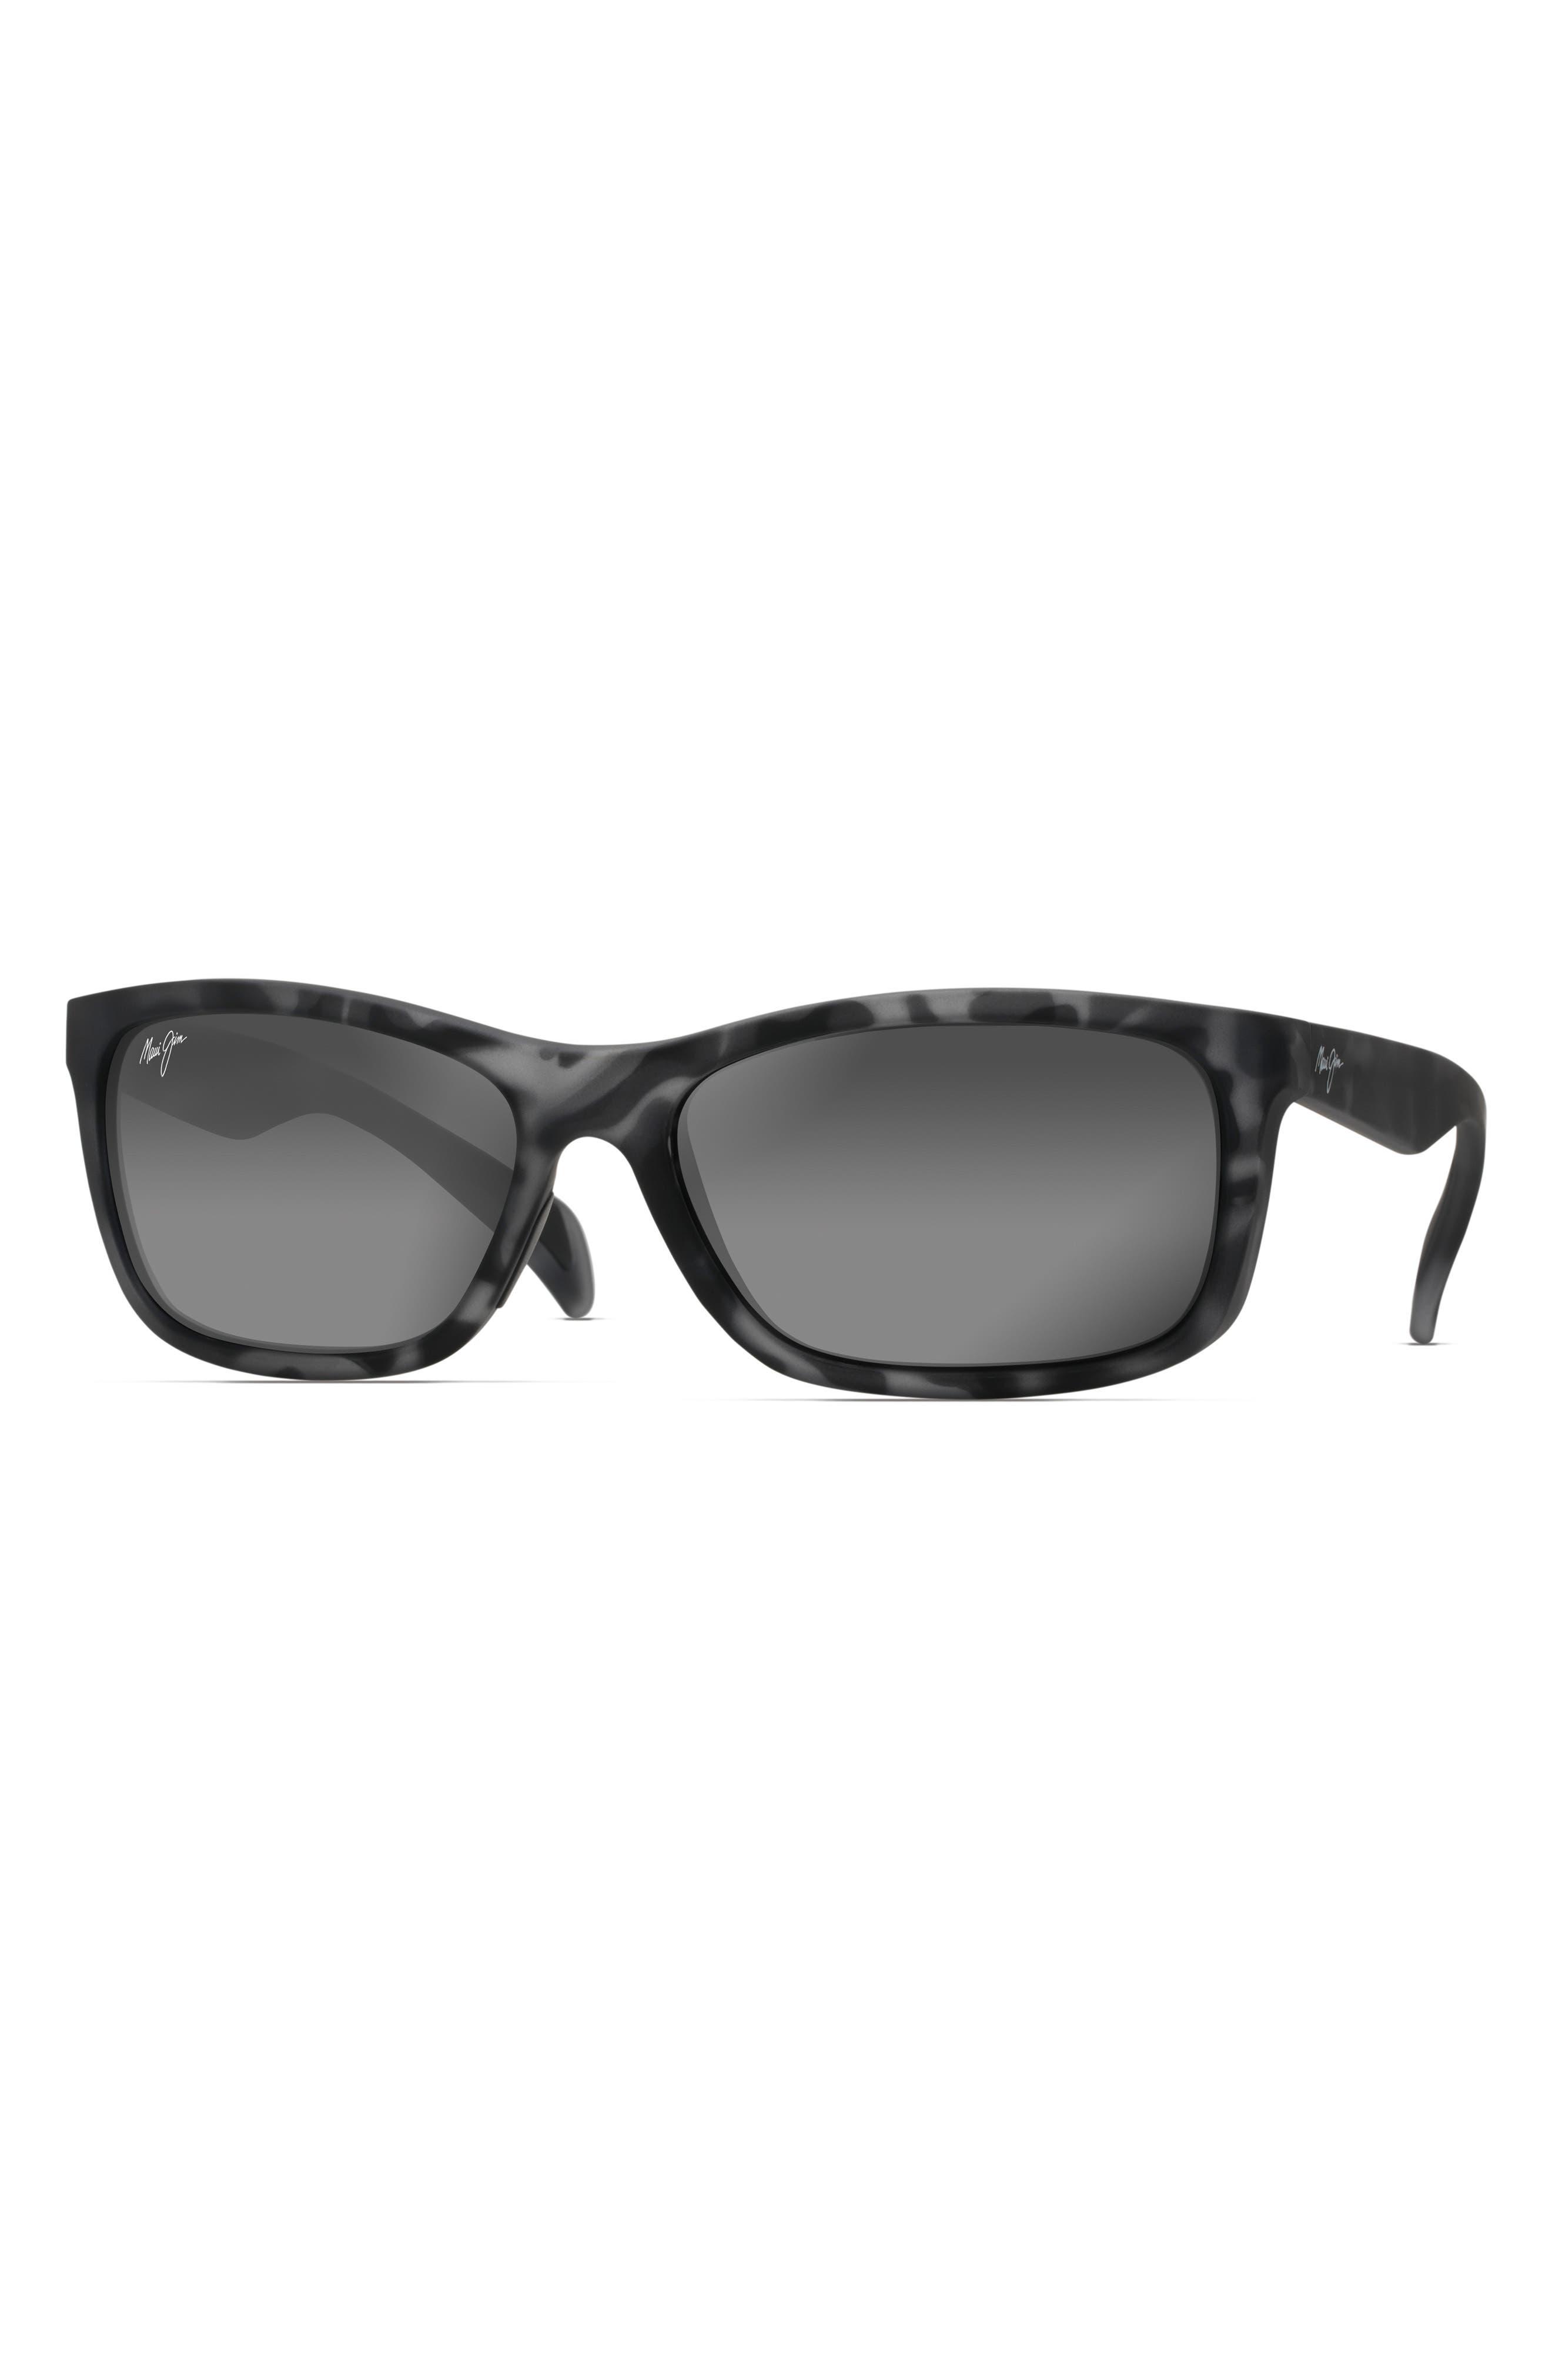 Puhi 59mm Polarized Sunglasses